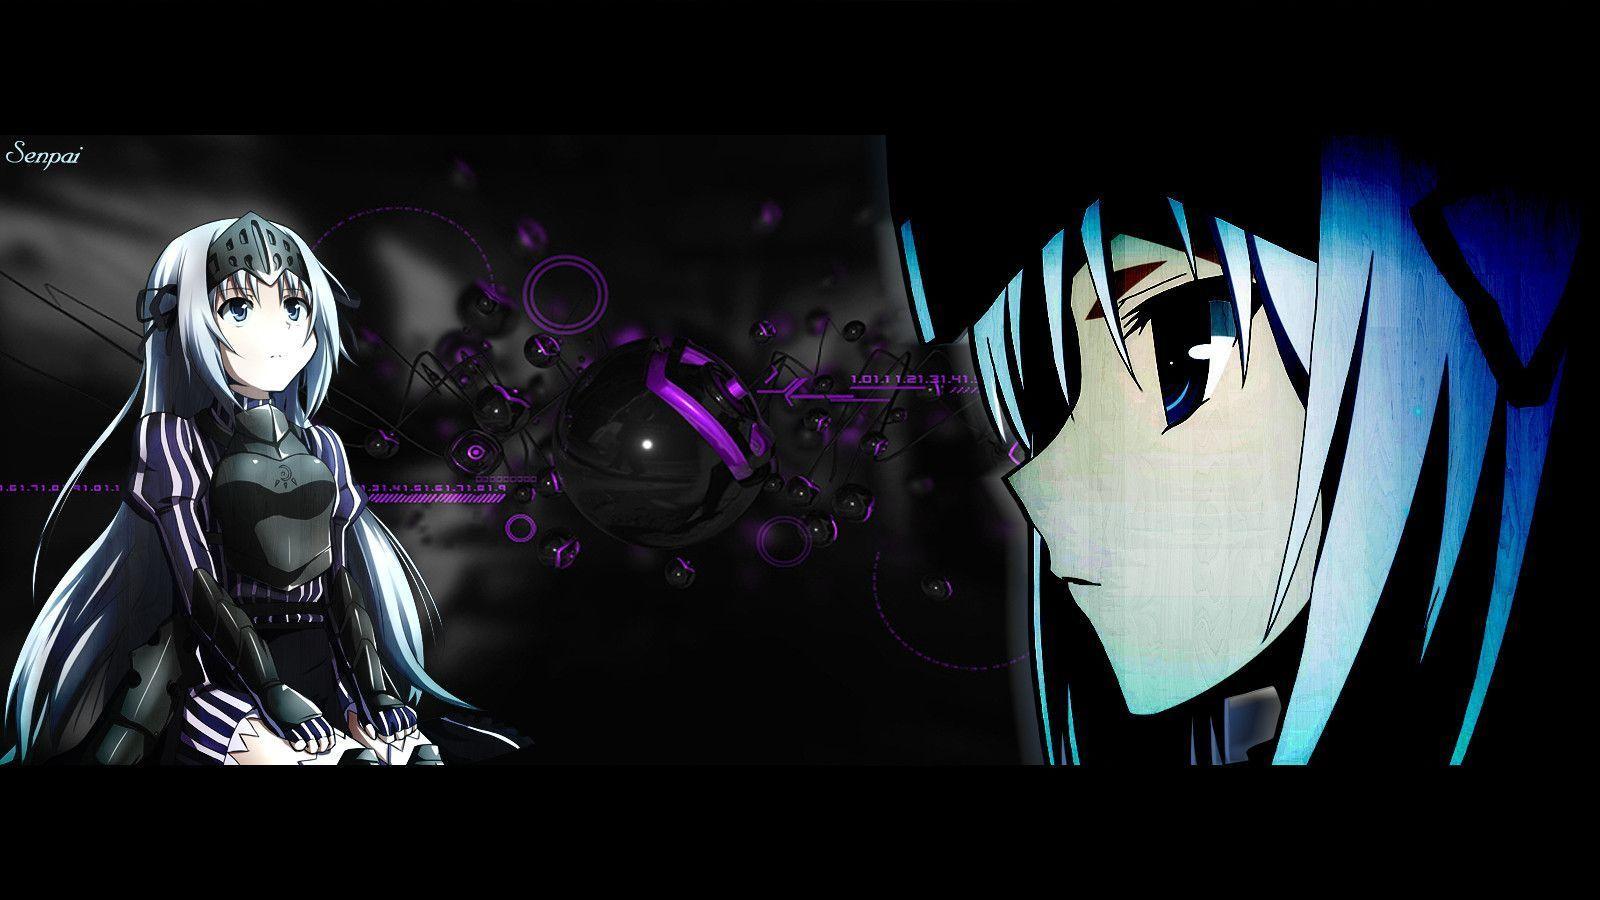 Kore Wa Zombie Desu Ka Hd Wallpapers And Backgrounds Kore Wa Zombie Desu Ka Anime Zombie